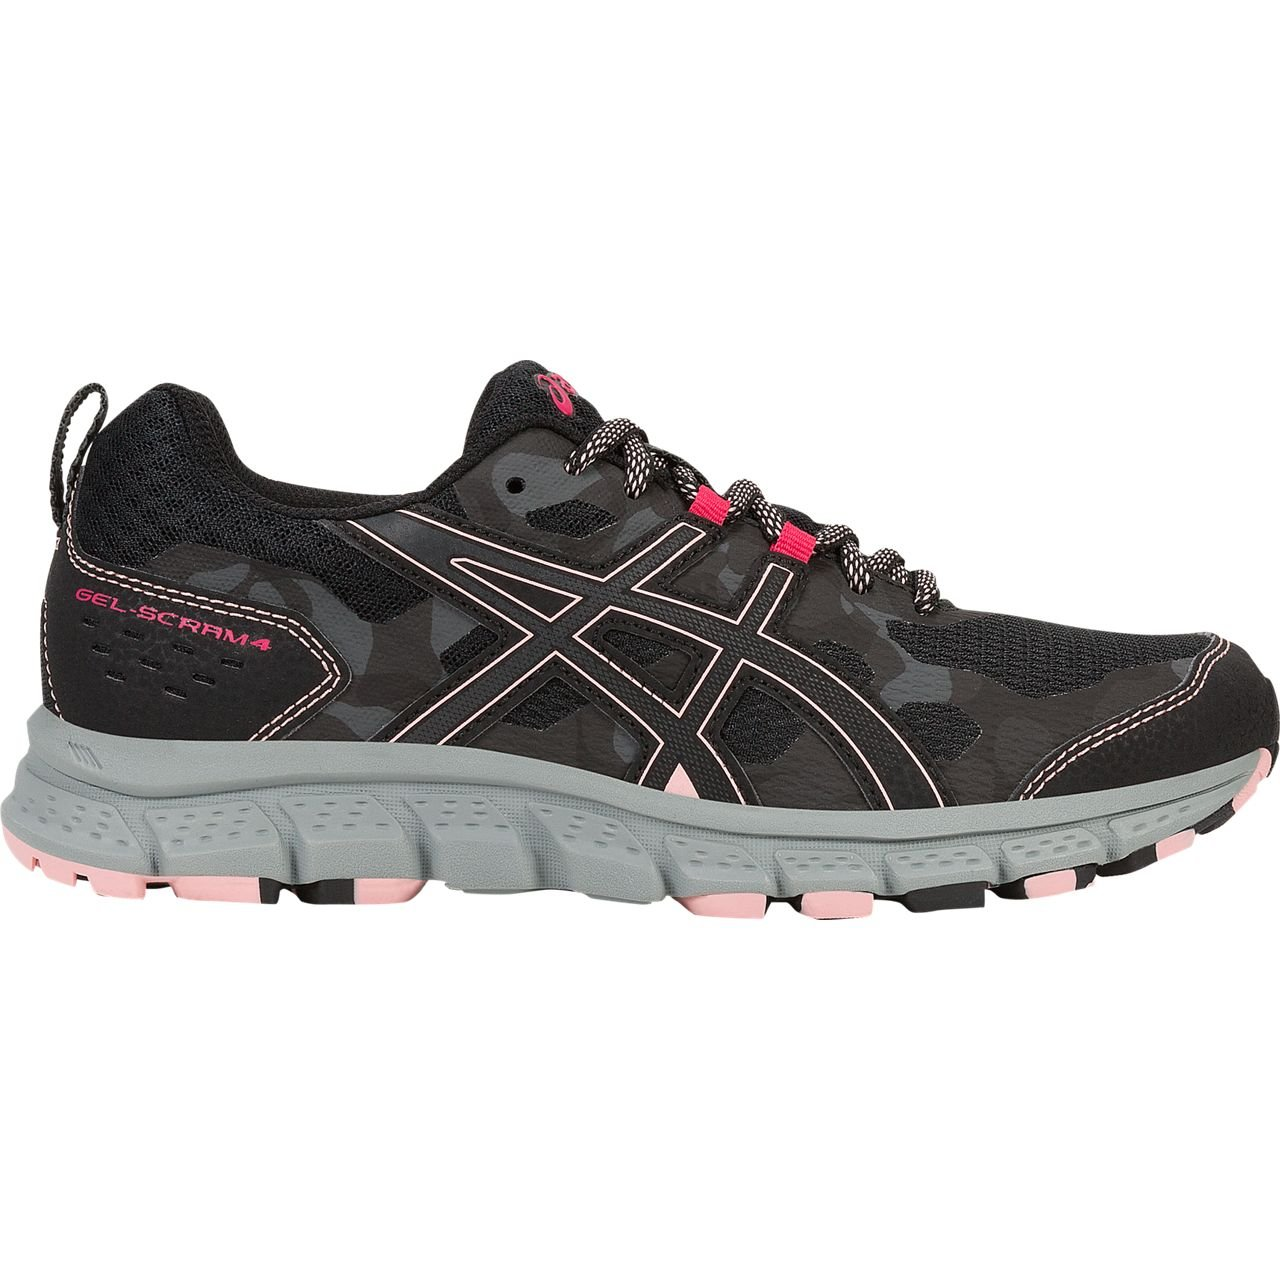 ASICS 1012A039 Women's Gel-Scram 4 Running Shoe, Black/Dark Grey - 5.5 B(M) US